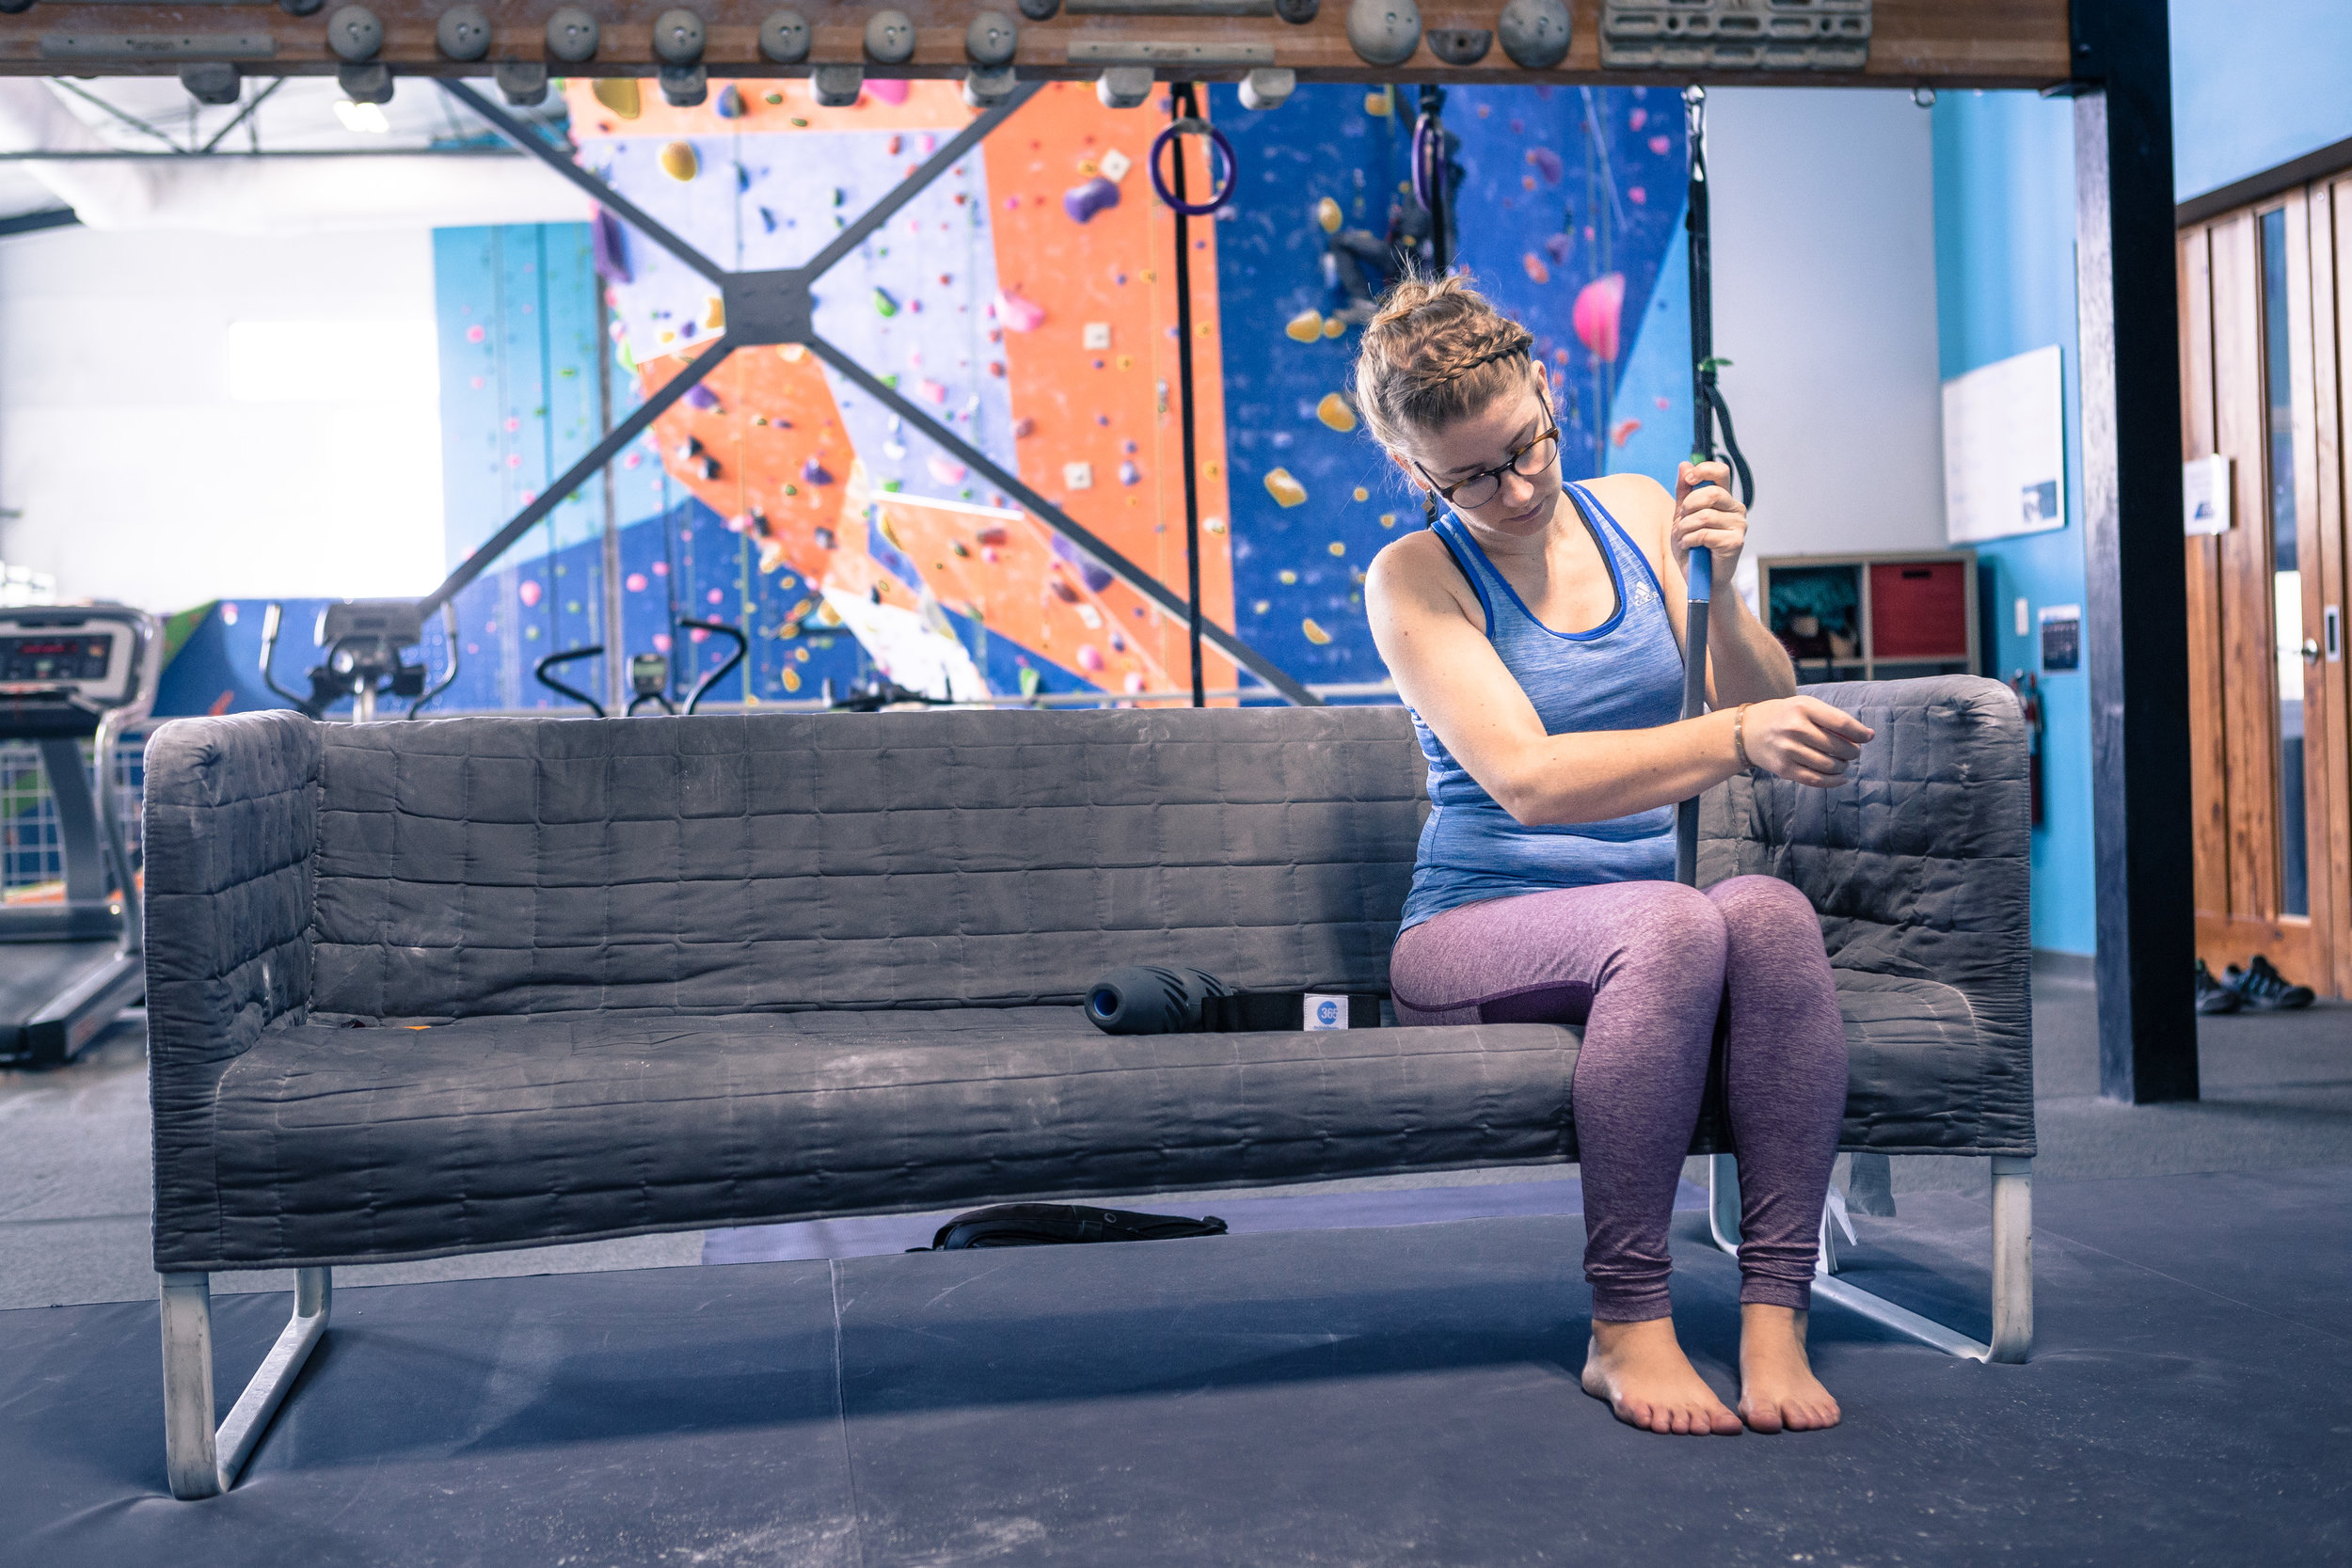 02.03.19 Kristina Yoga Ascent Studio-11.jpg